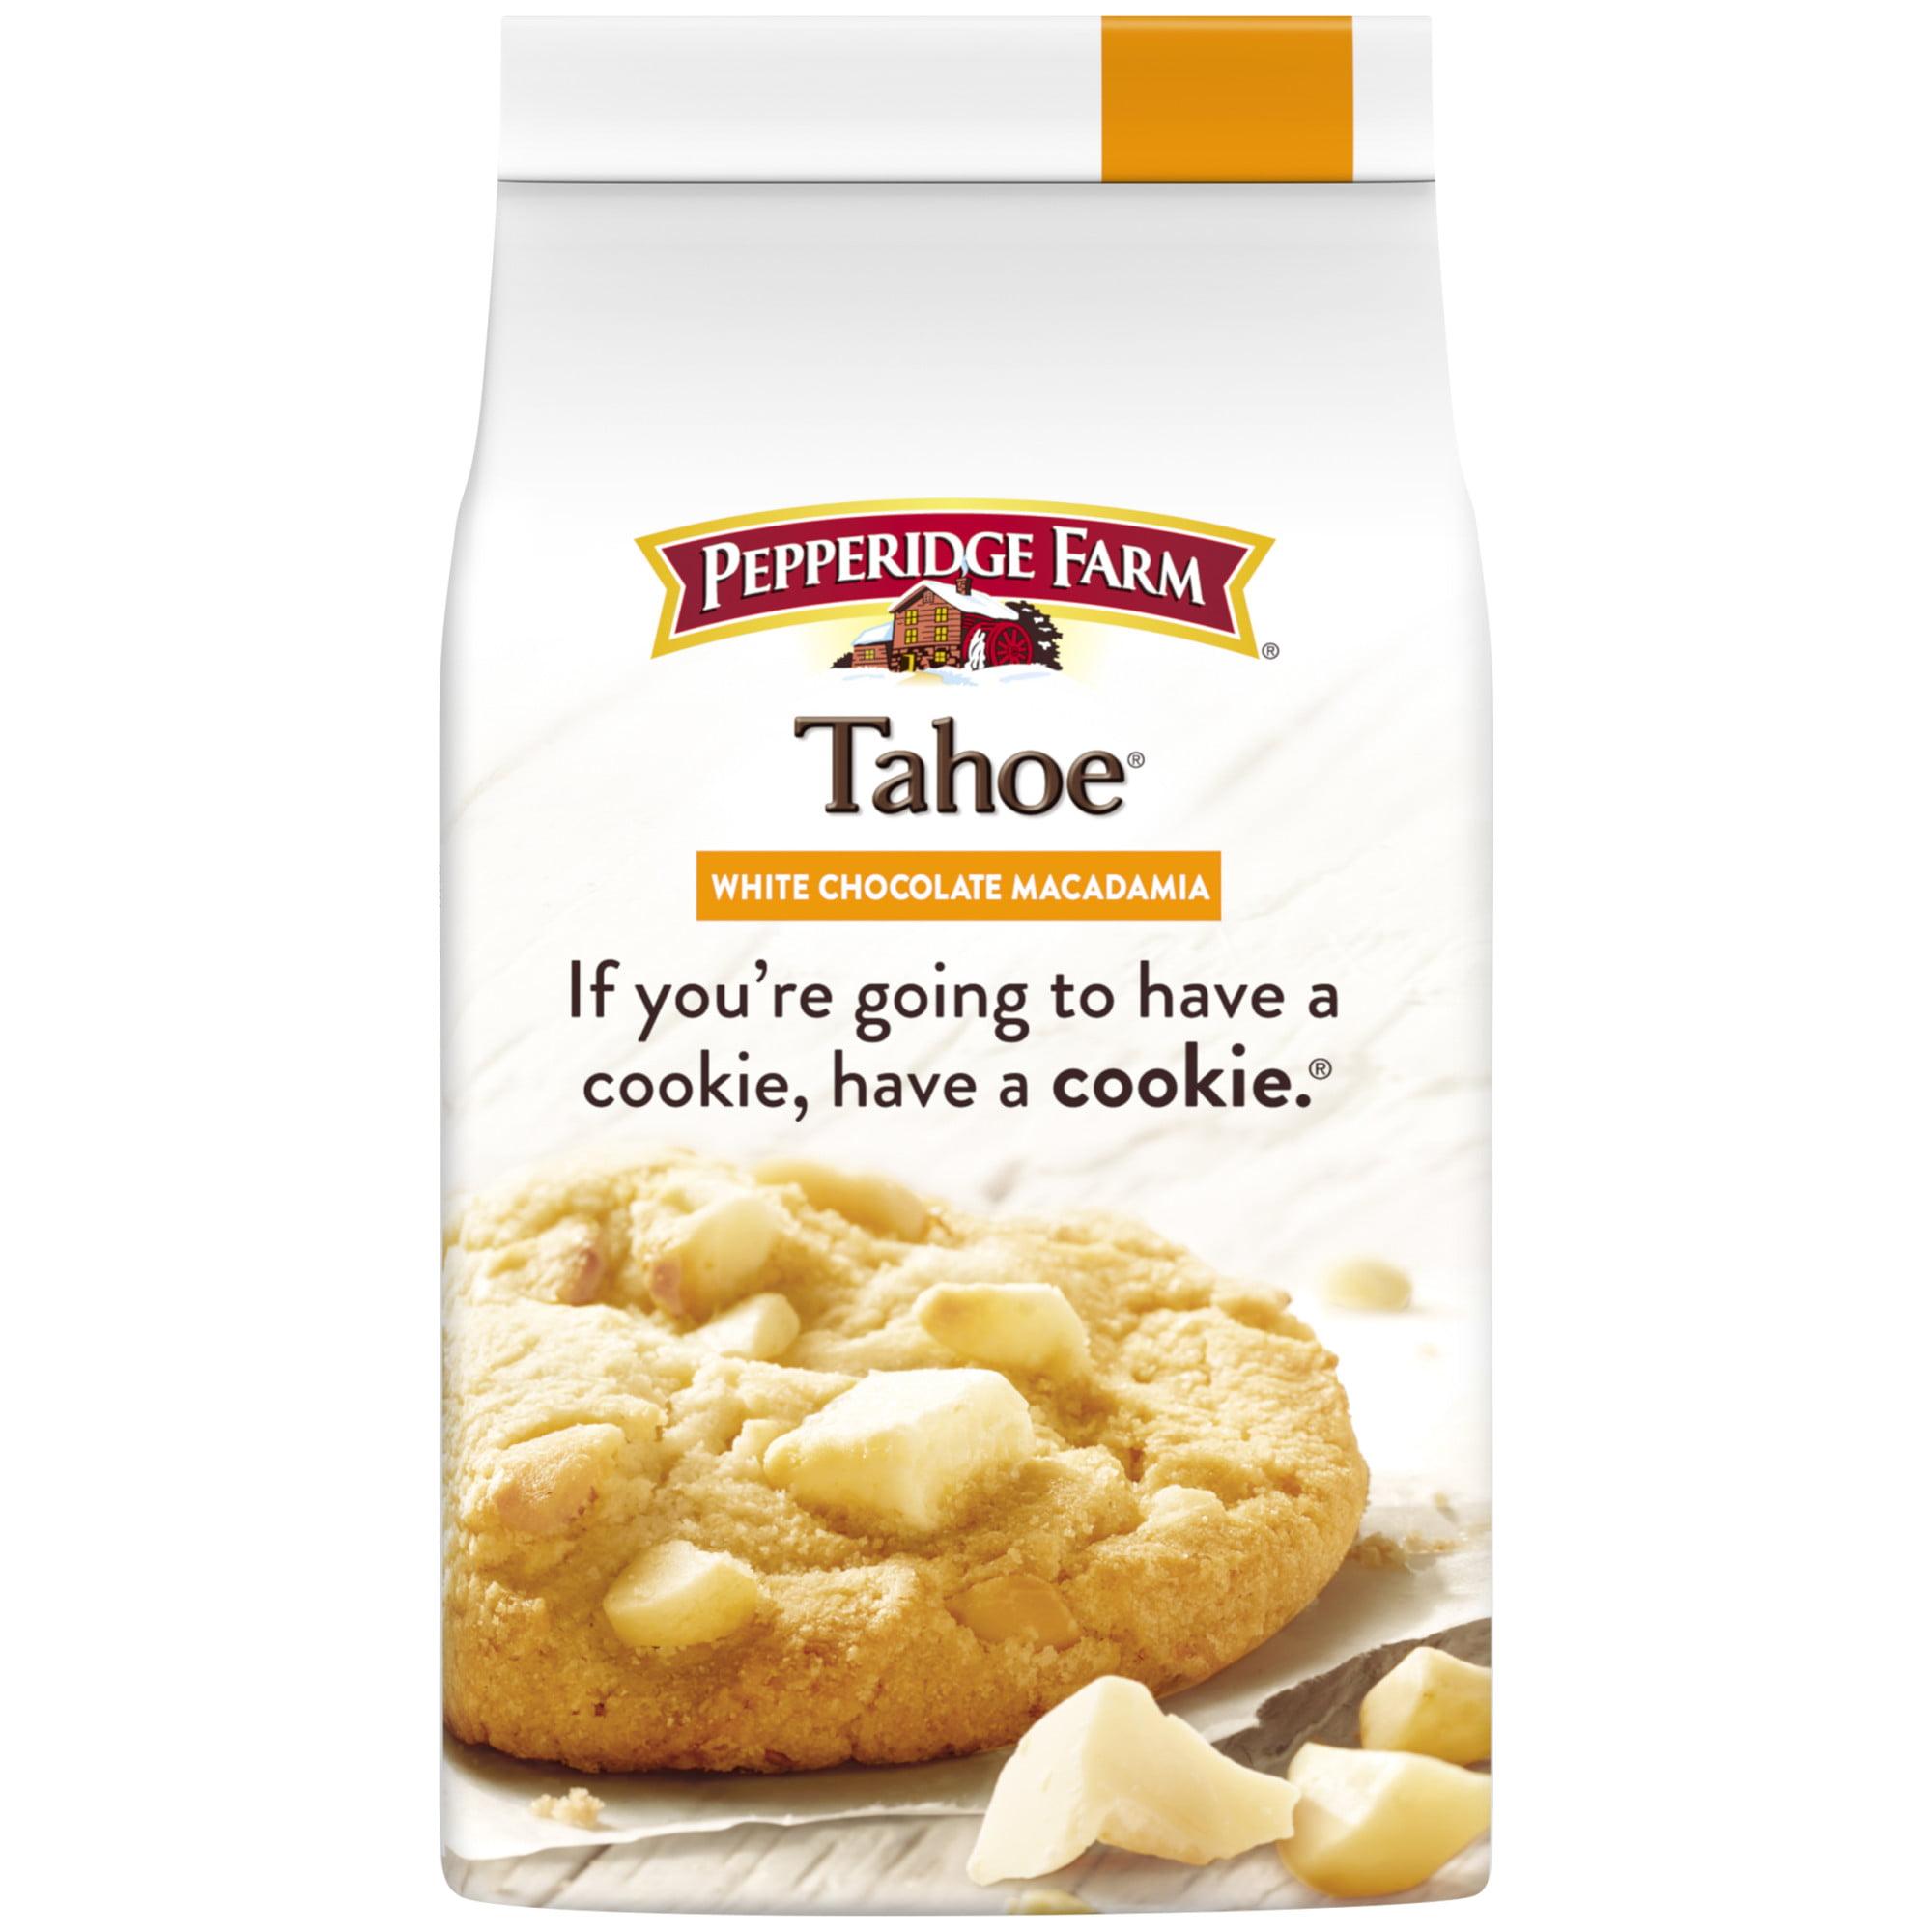 Pepperidge Farm Tahoe Crispy White Chocolate Macadamia Cookies 7 2 Oz Bag Walmart Com Walmart Com